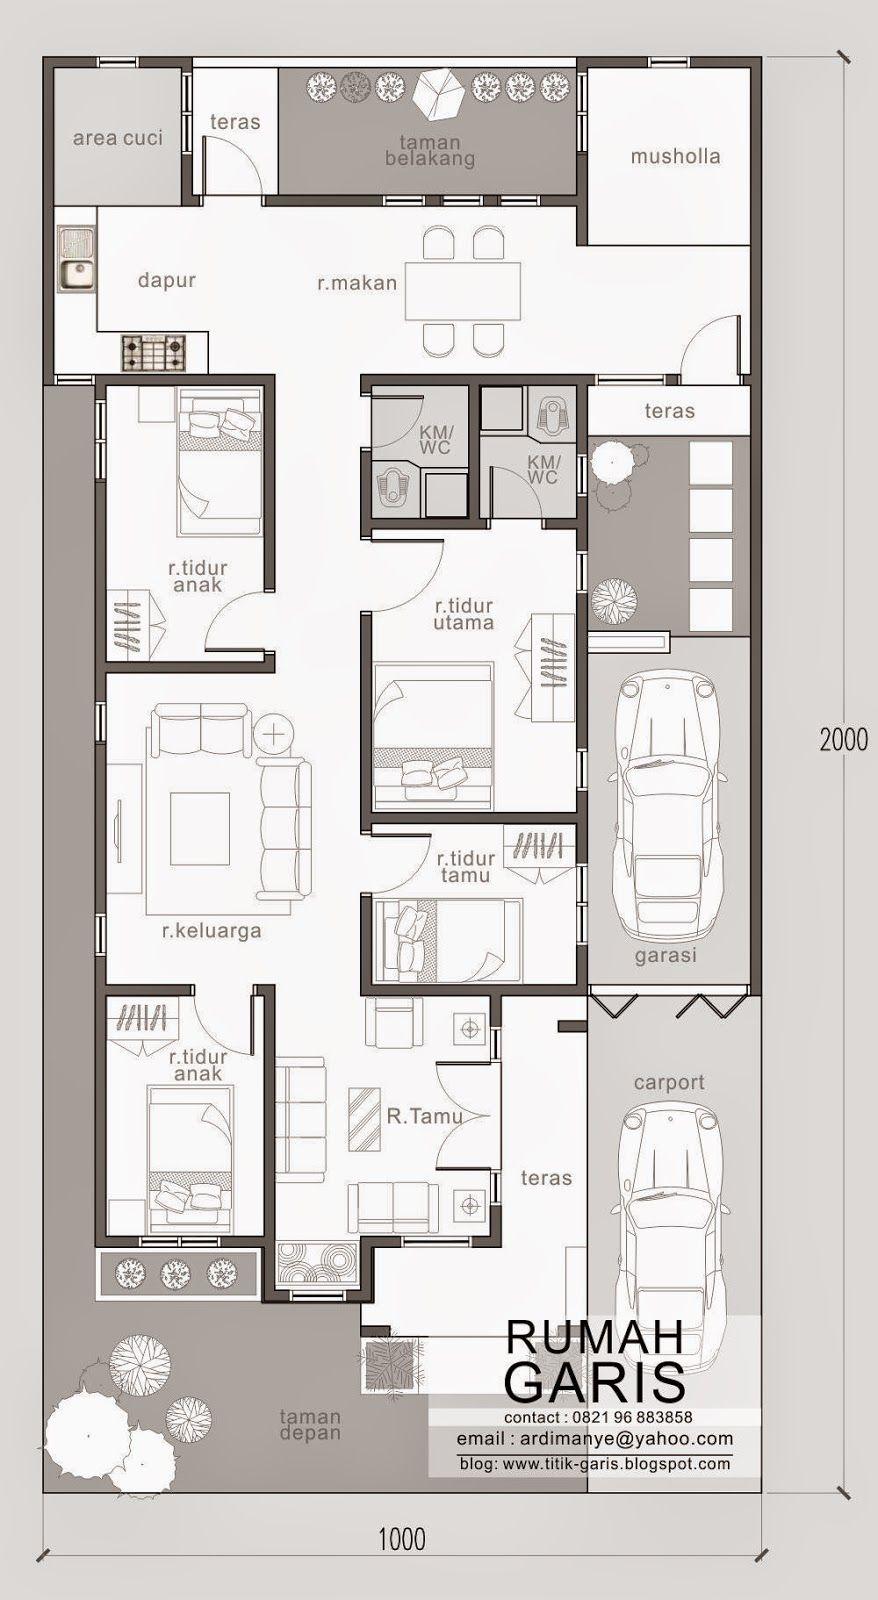 4 2 33 X 66 Footprint Including Garage Jasa Desain Rumah Online